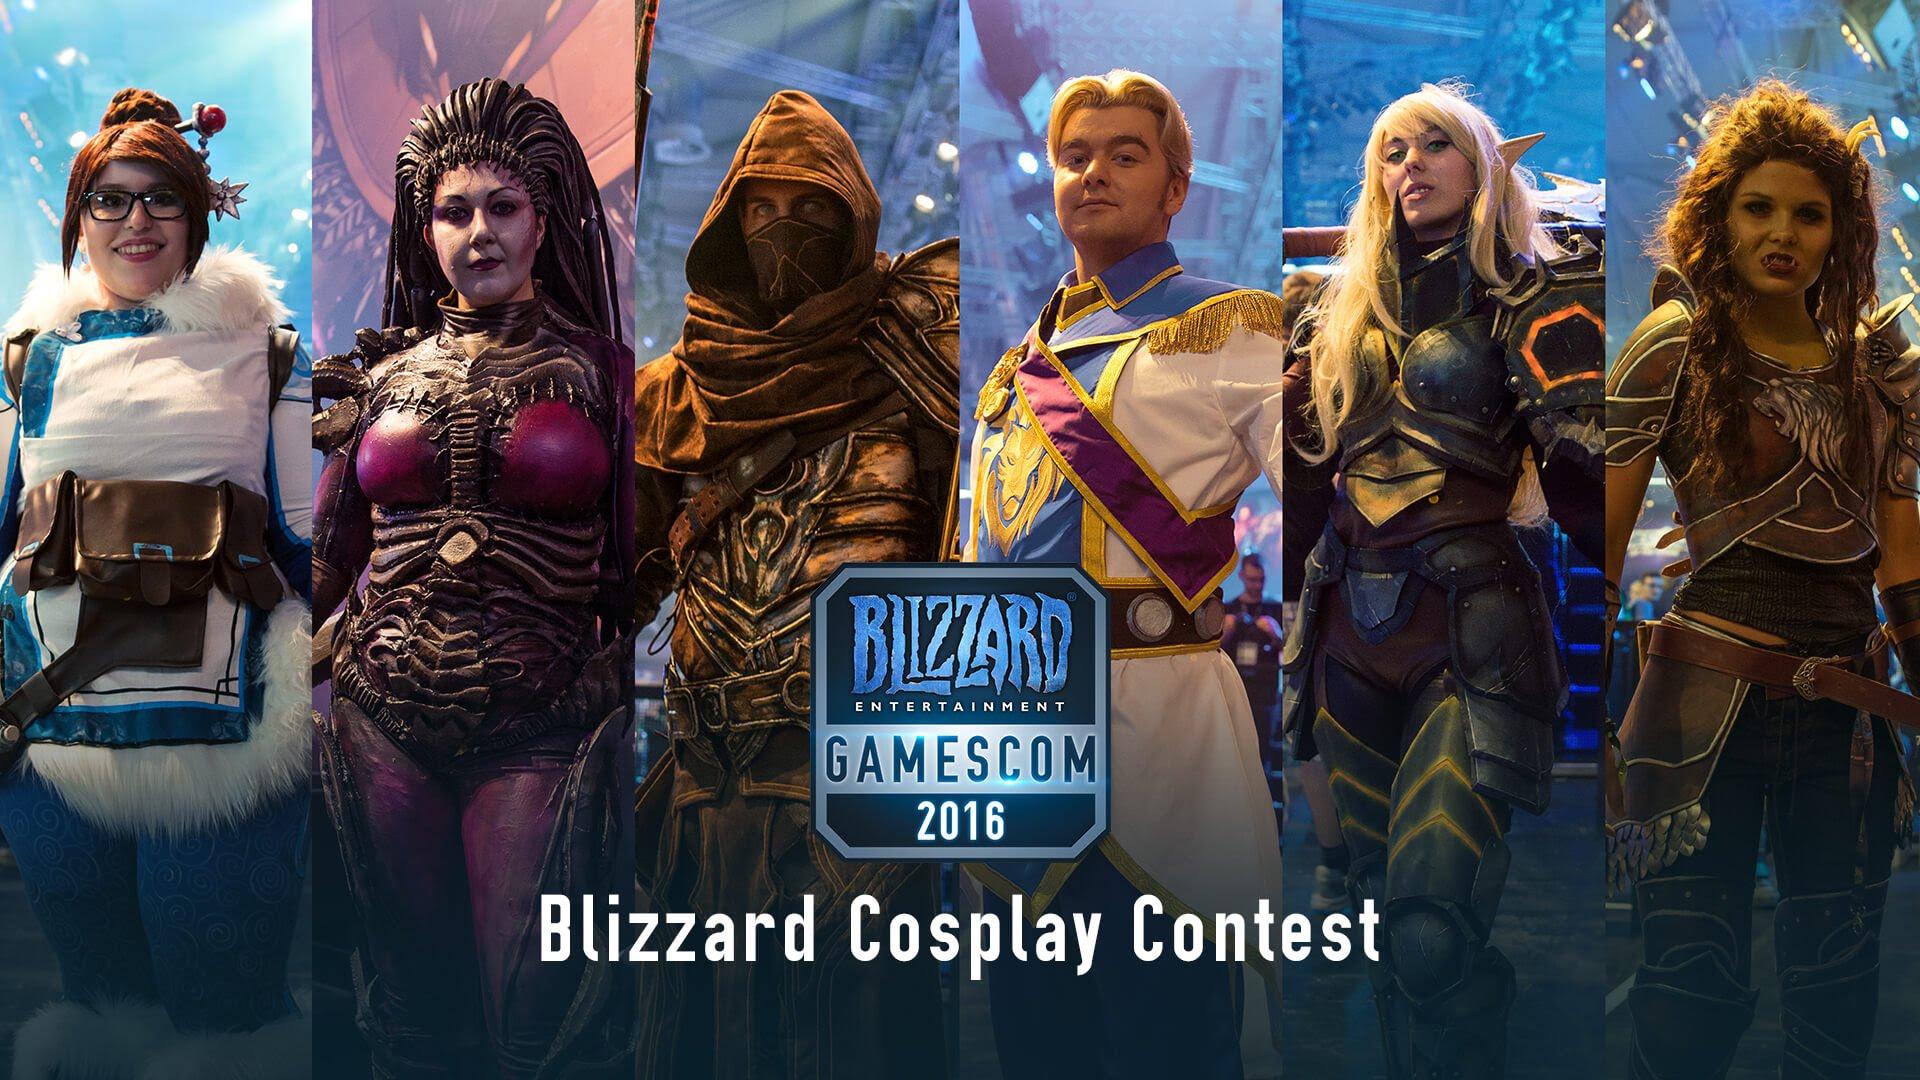 gamescom 2016 revivez le concours de cosplay blizzard en. Black Bedroom Furniture Sets. Home Design Ideas